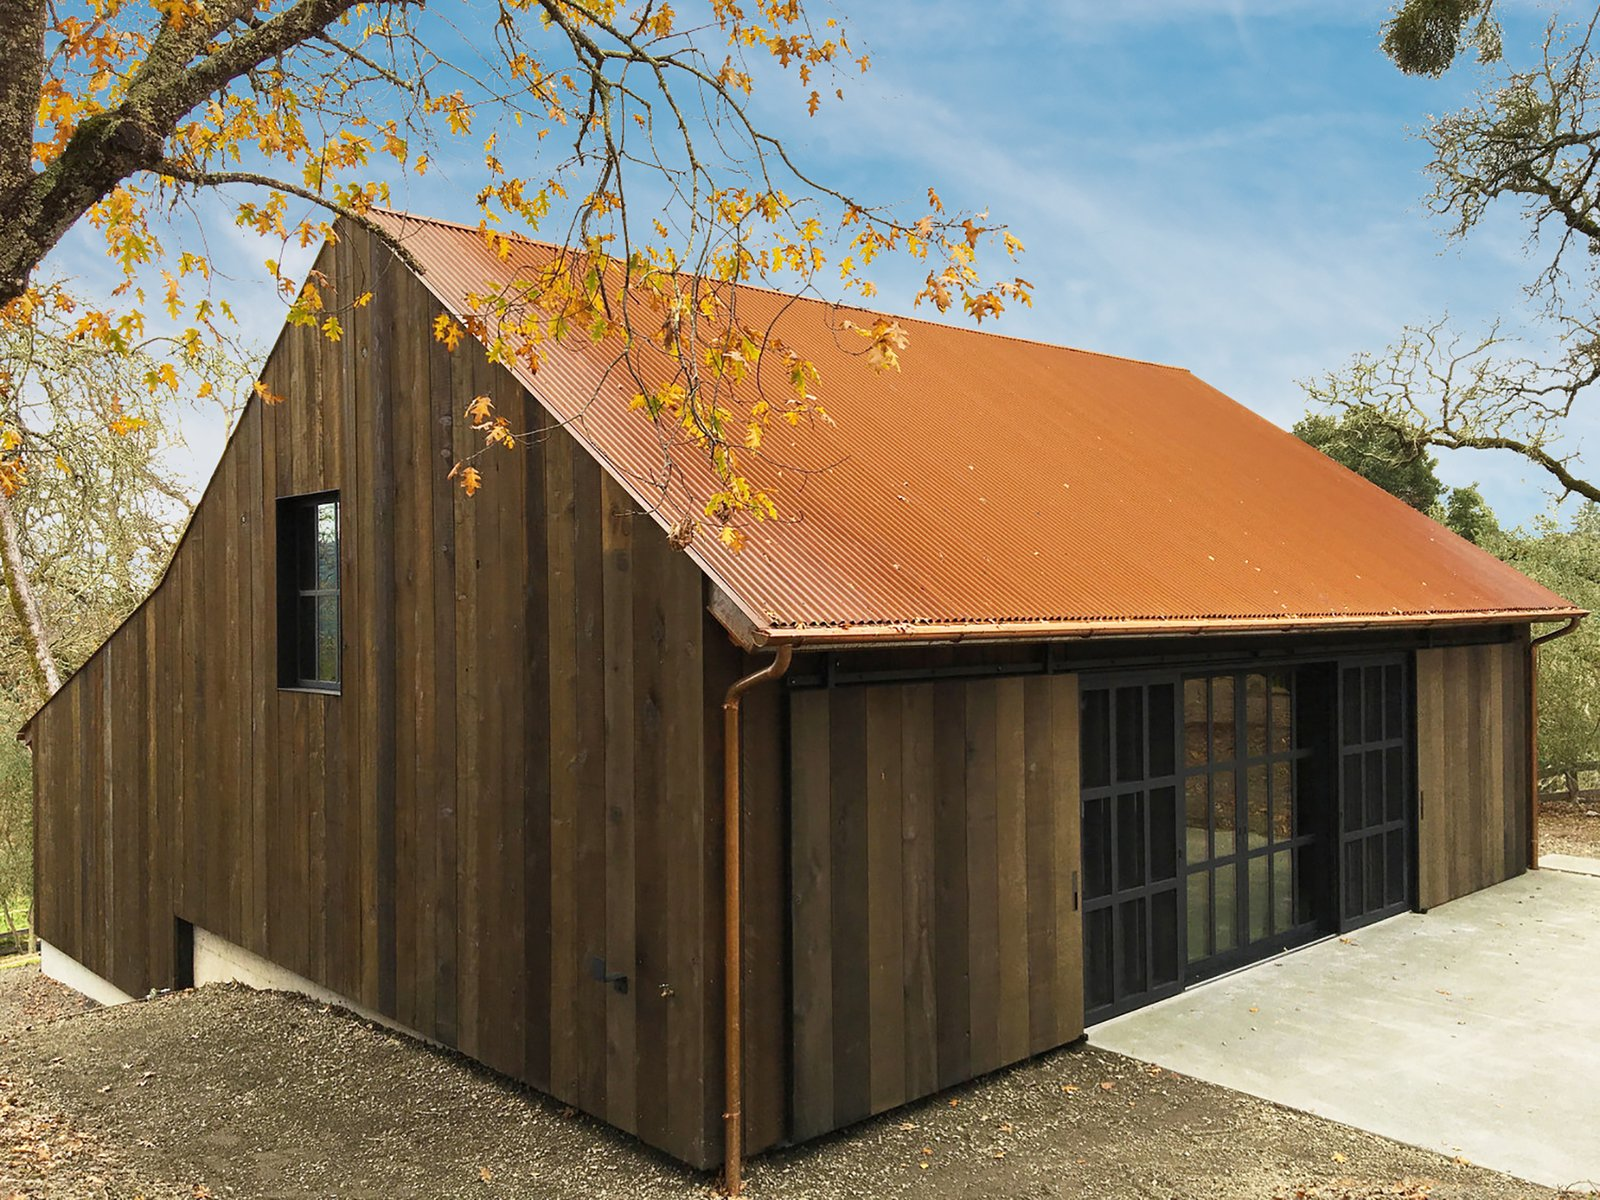 Tack Barn Reuse by Faulkner Architects sliding barn doors